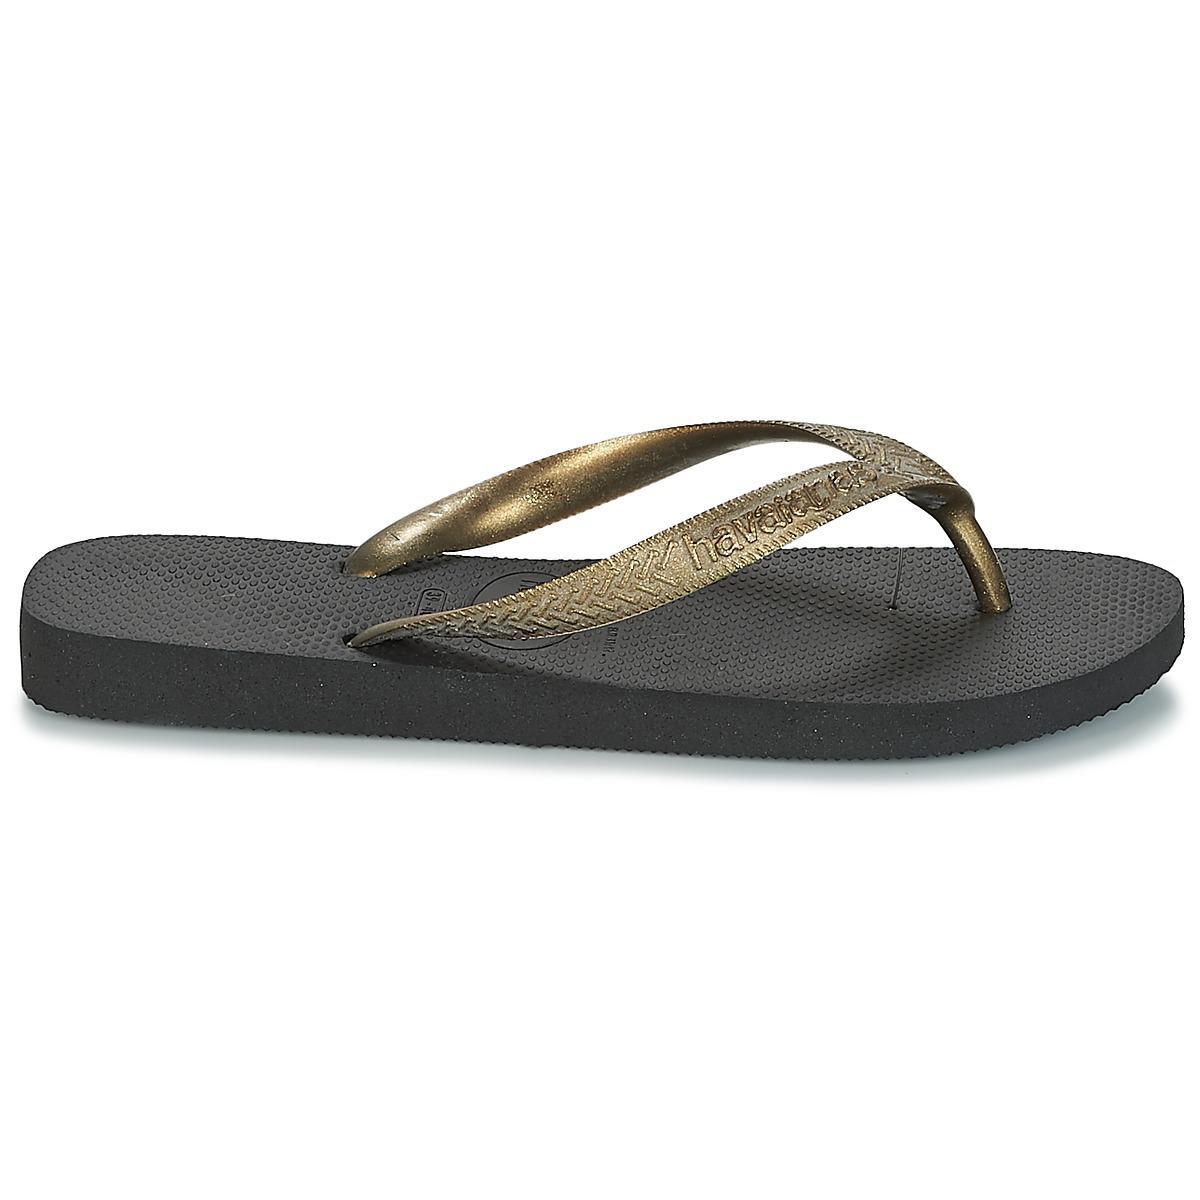 10b9e7b445a2 Havaianas Top Logo Metallic Women s Flip Flops   Sandals (shoes) In ...